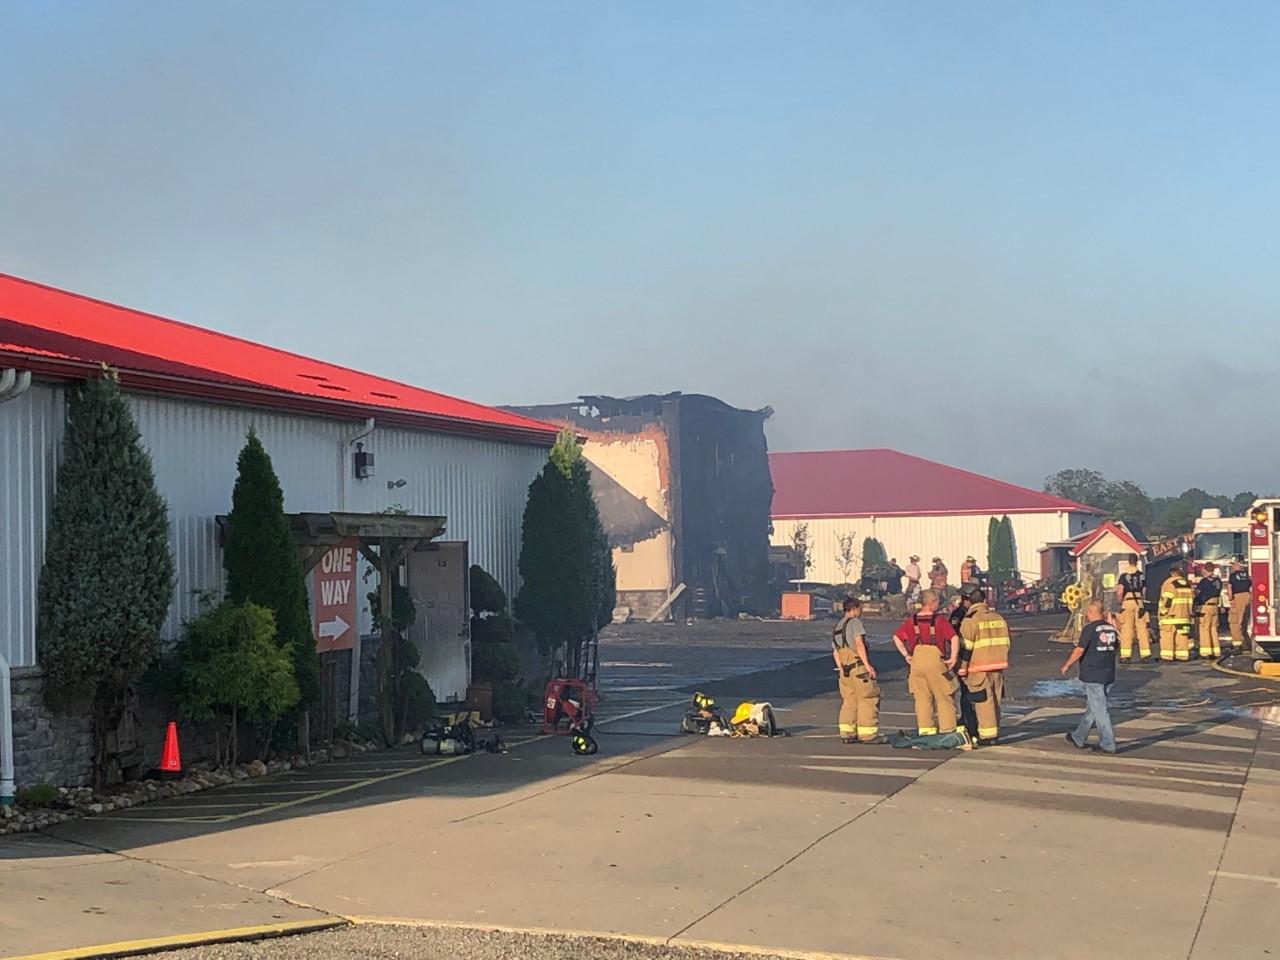 Massive fire destroys portion of cherished Walnut Creek